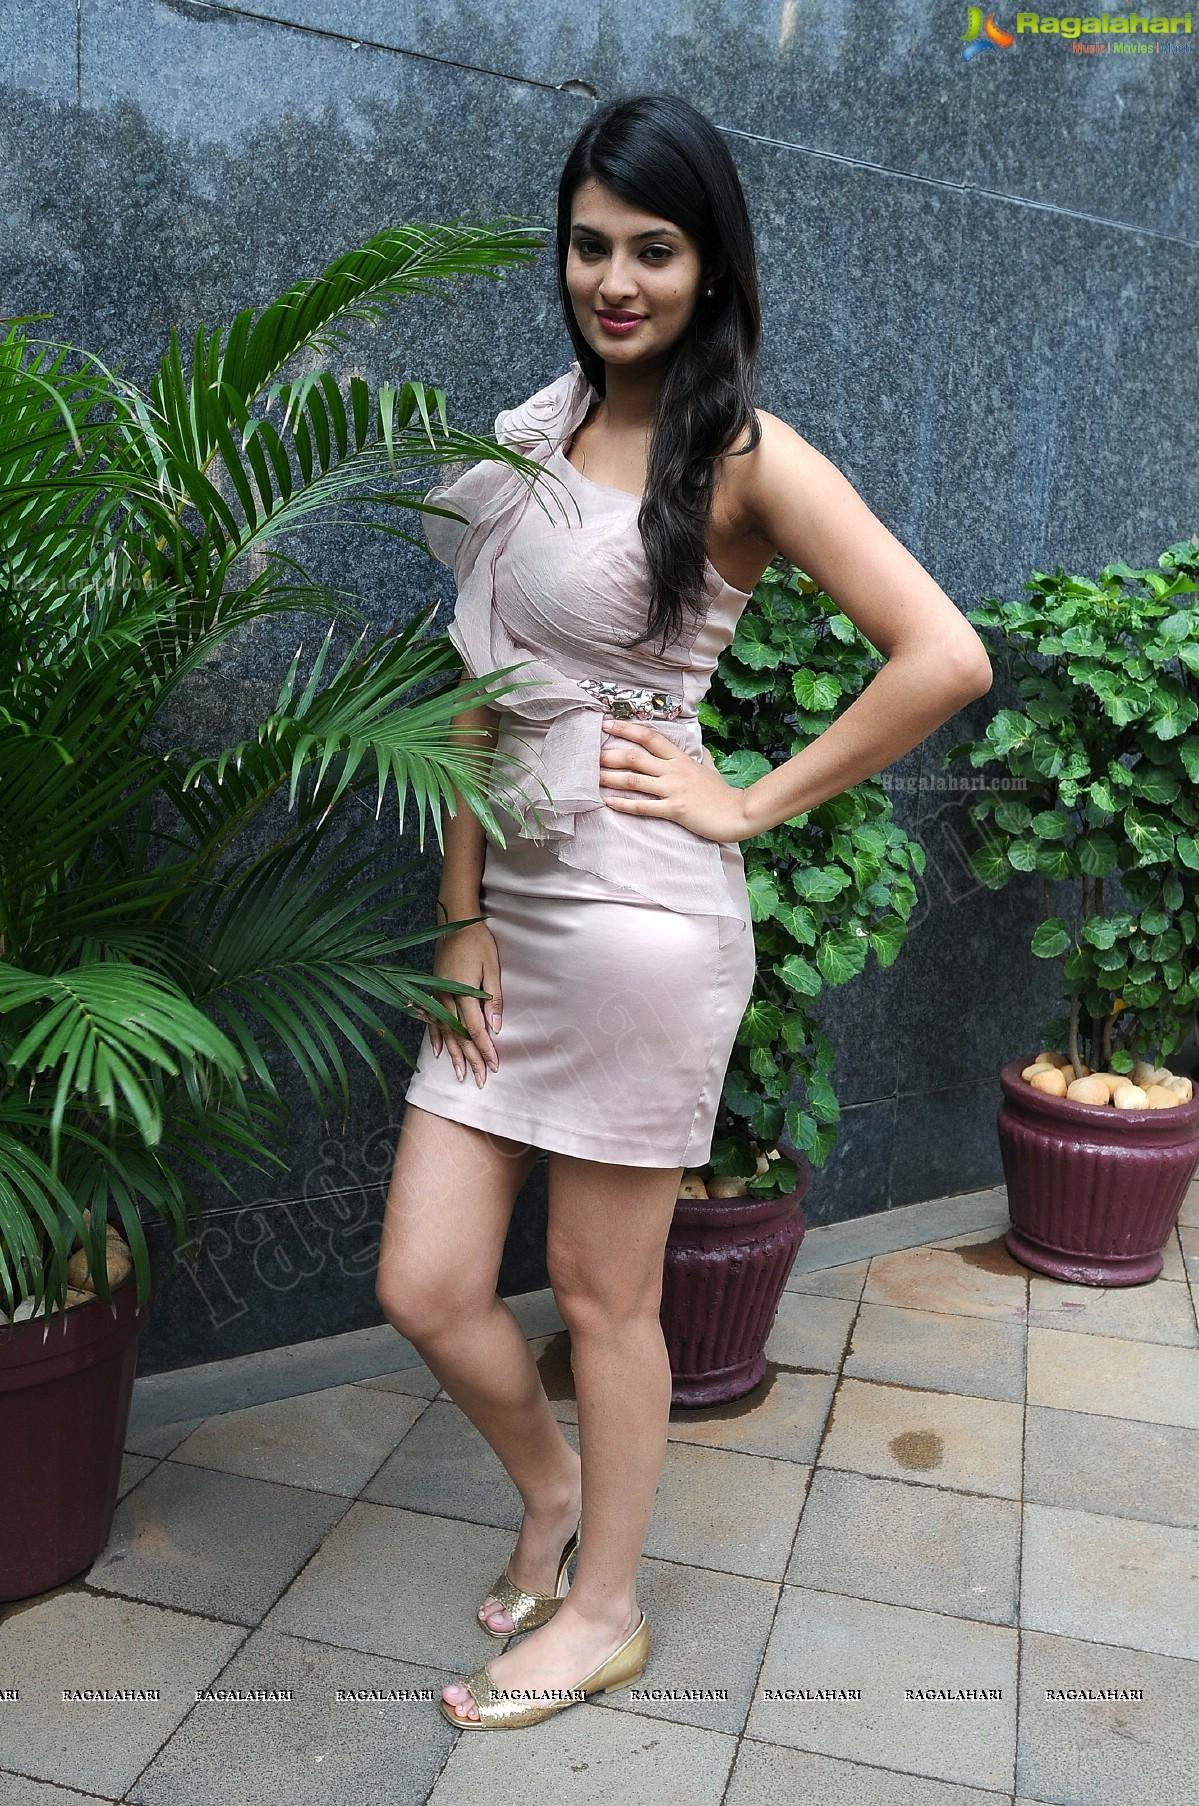 Sayali Bhagat Sayali Bhagat new pictures